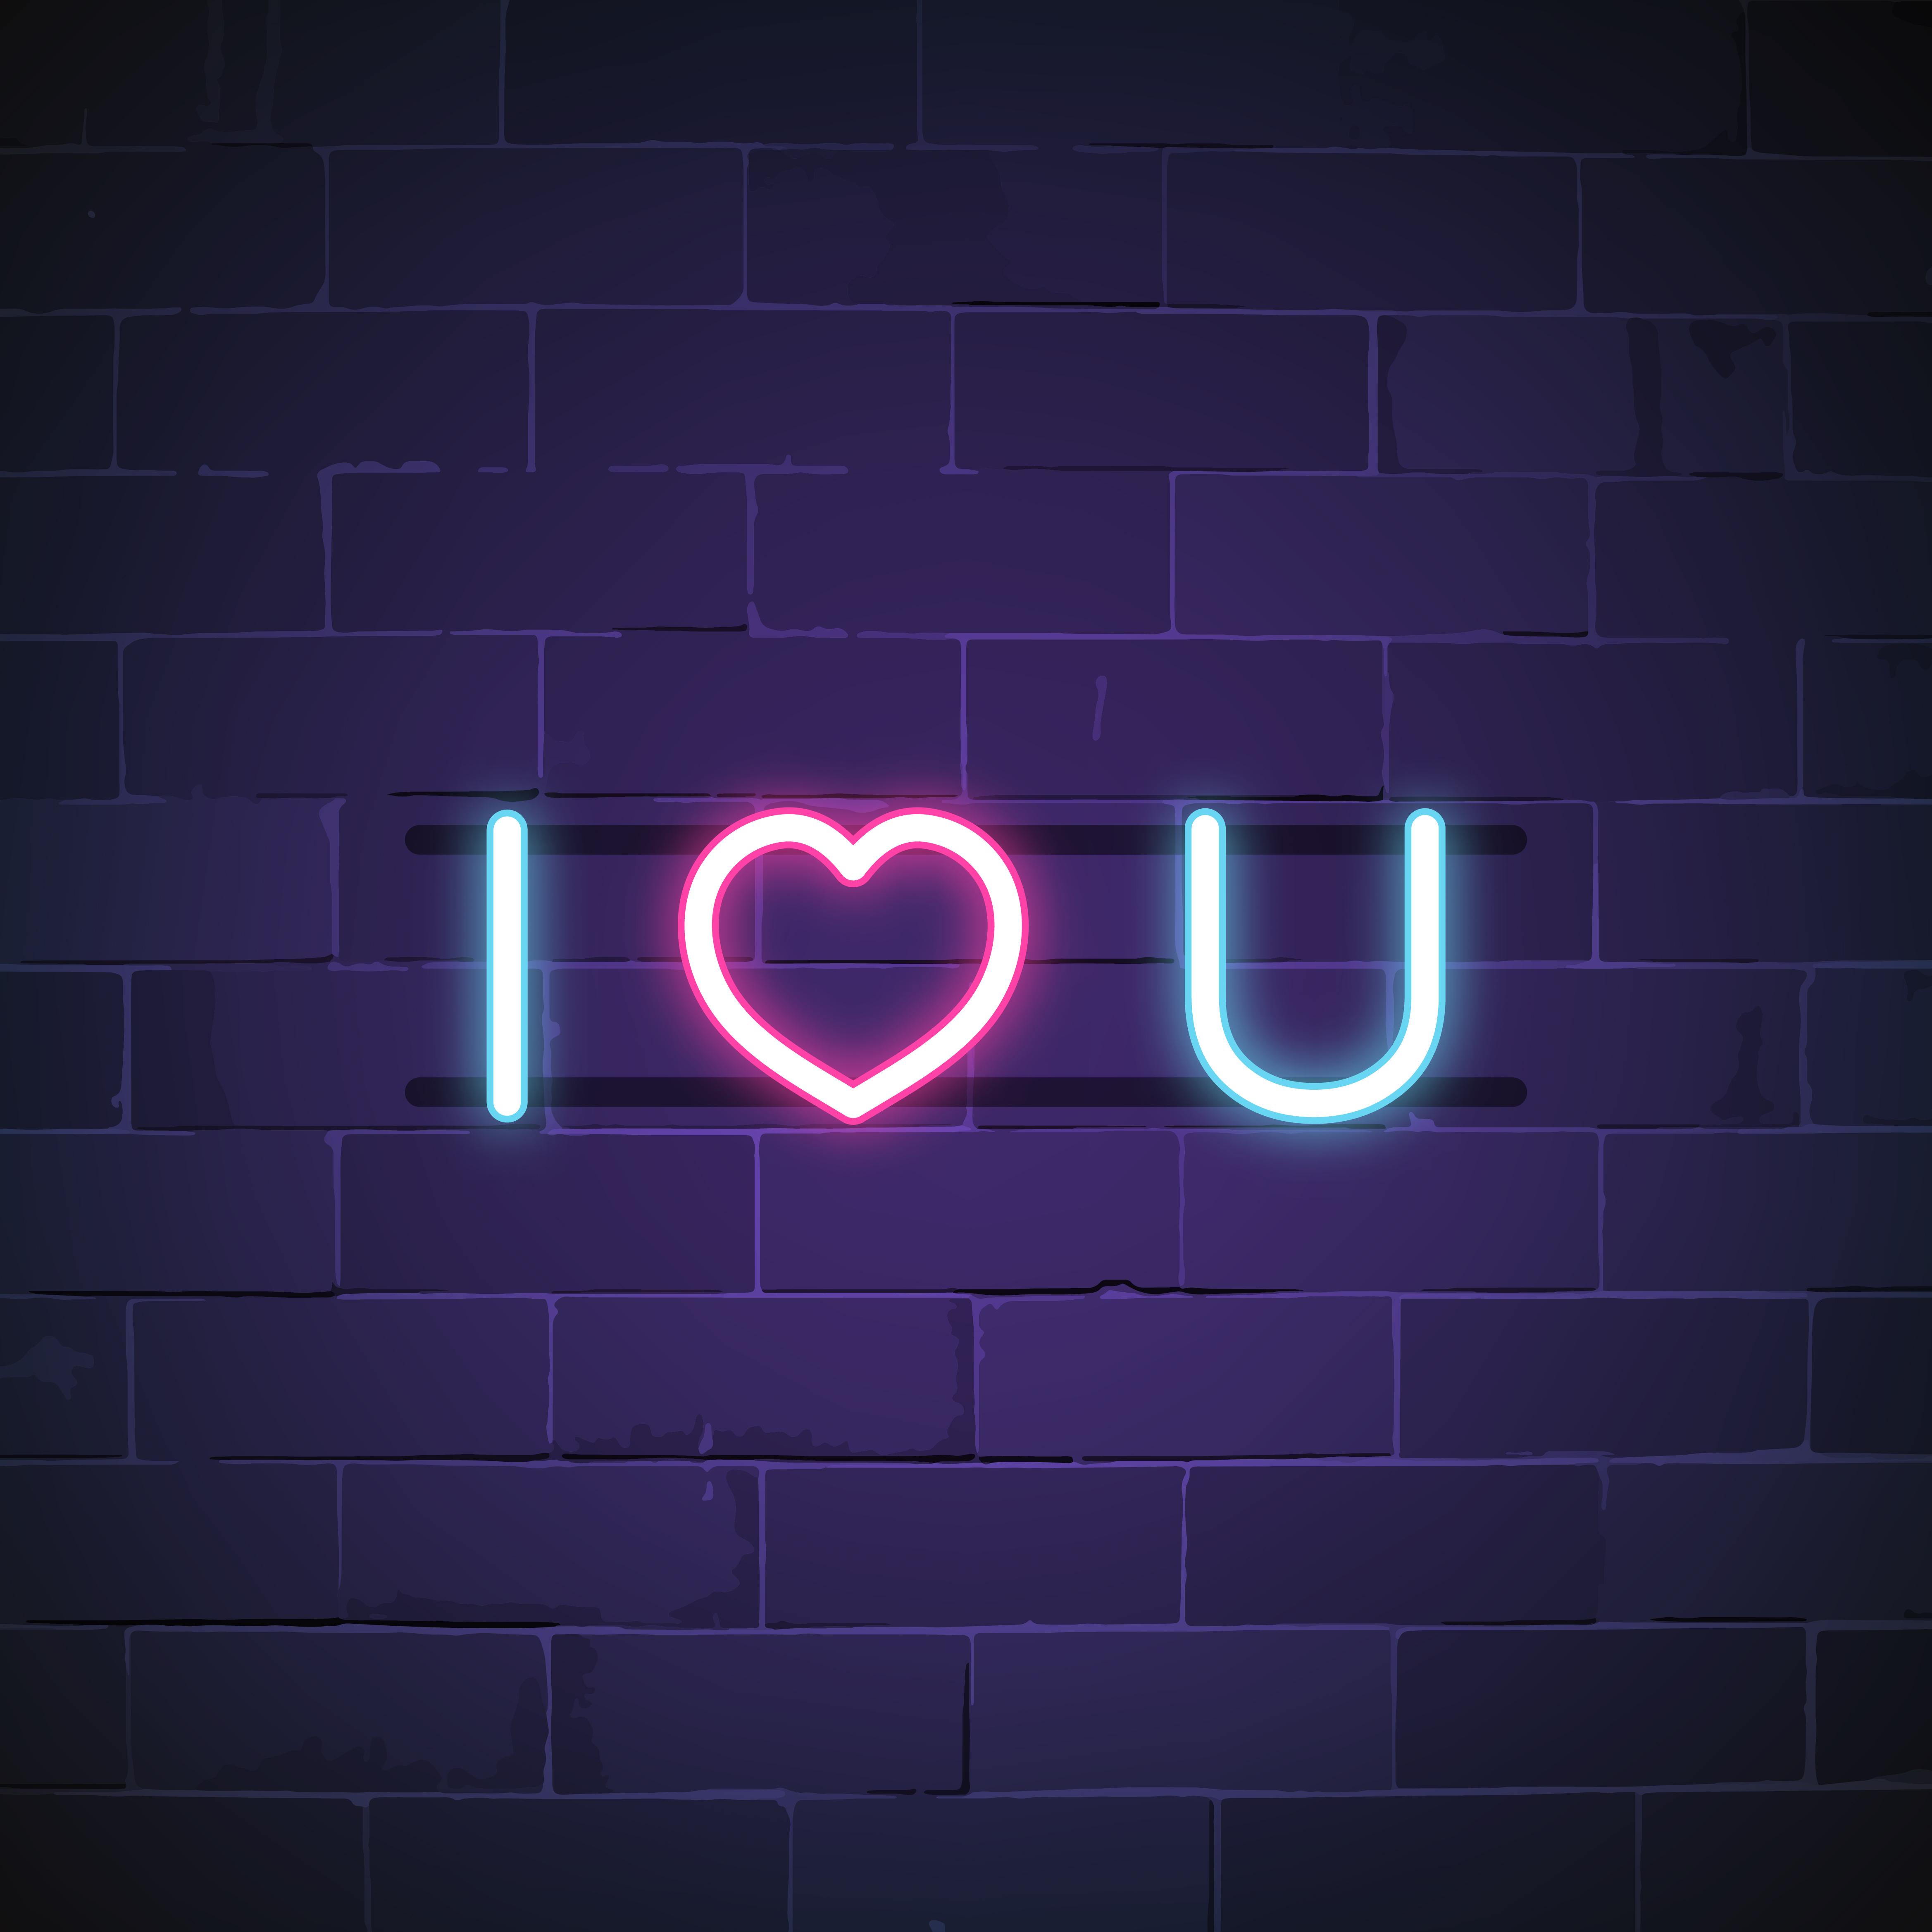 Download I love you neon sign vector - Download Free Vectors ...